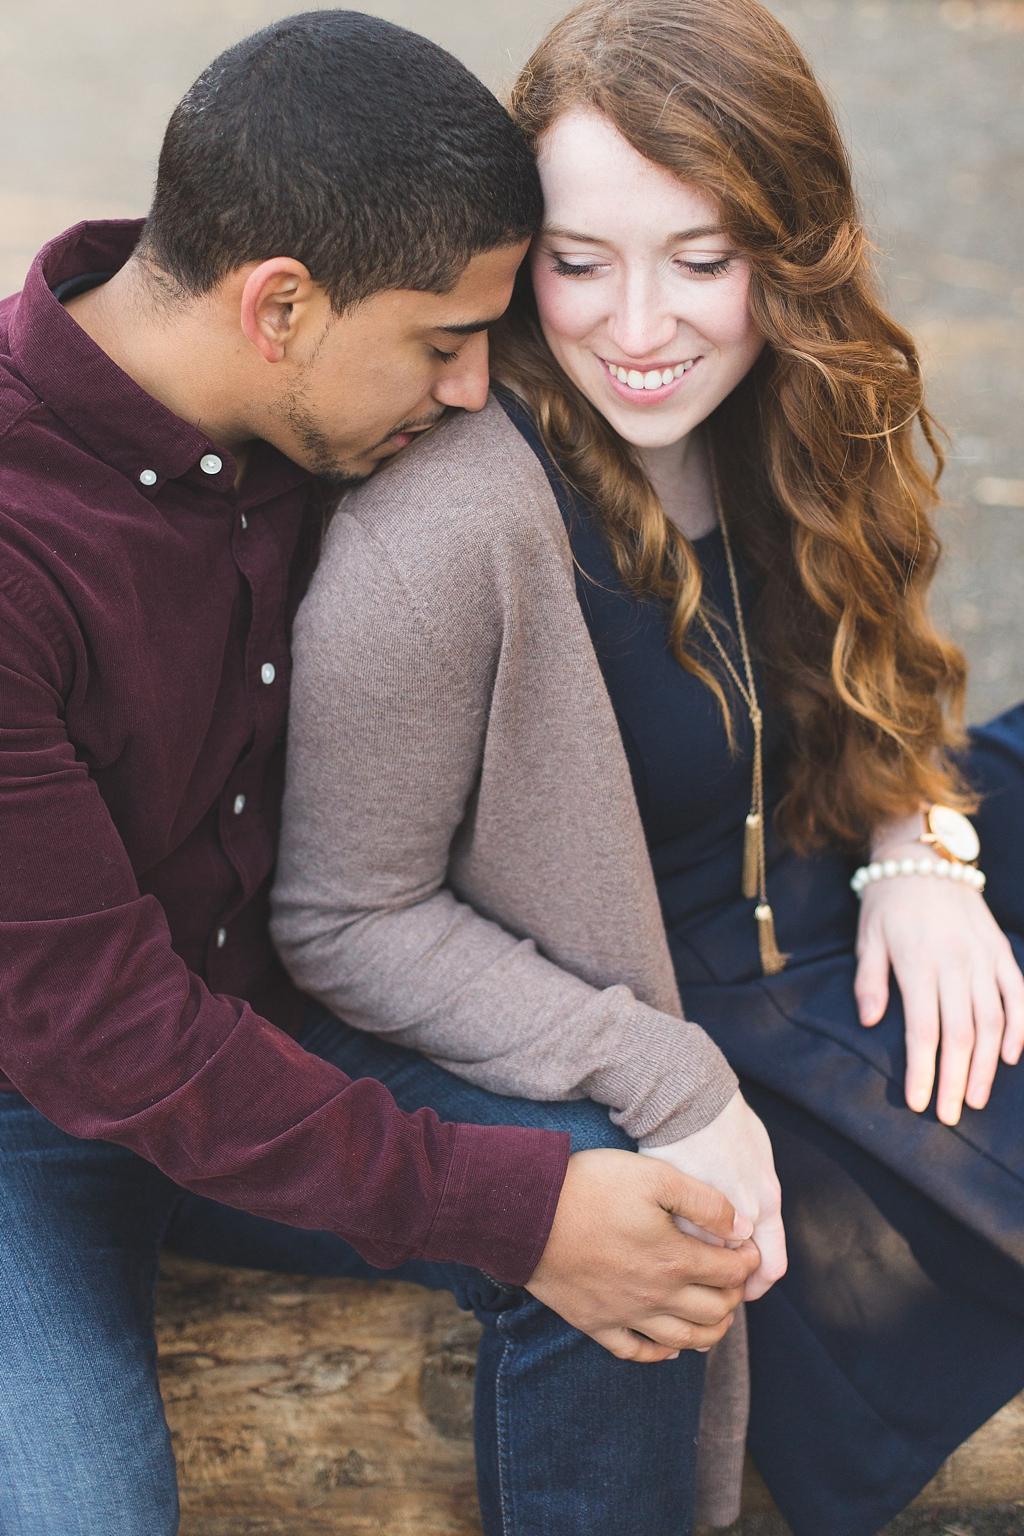 Morris County Engagement Photographer | North NJ Wedding Photographer